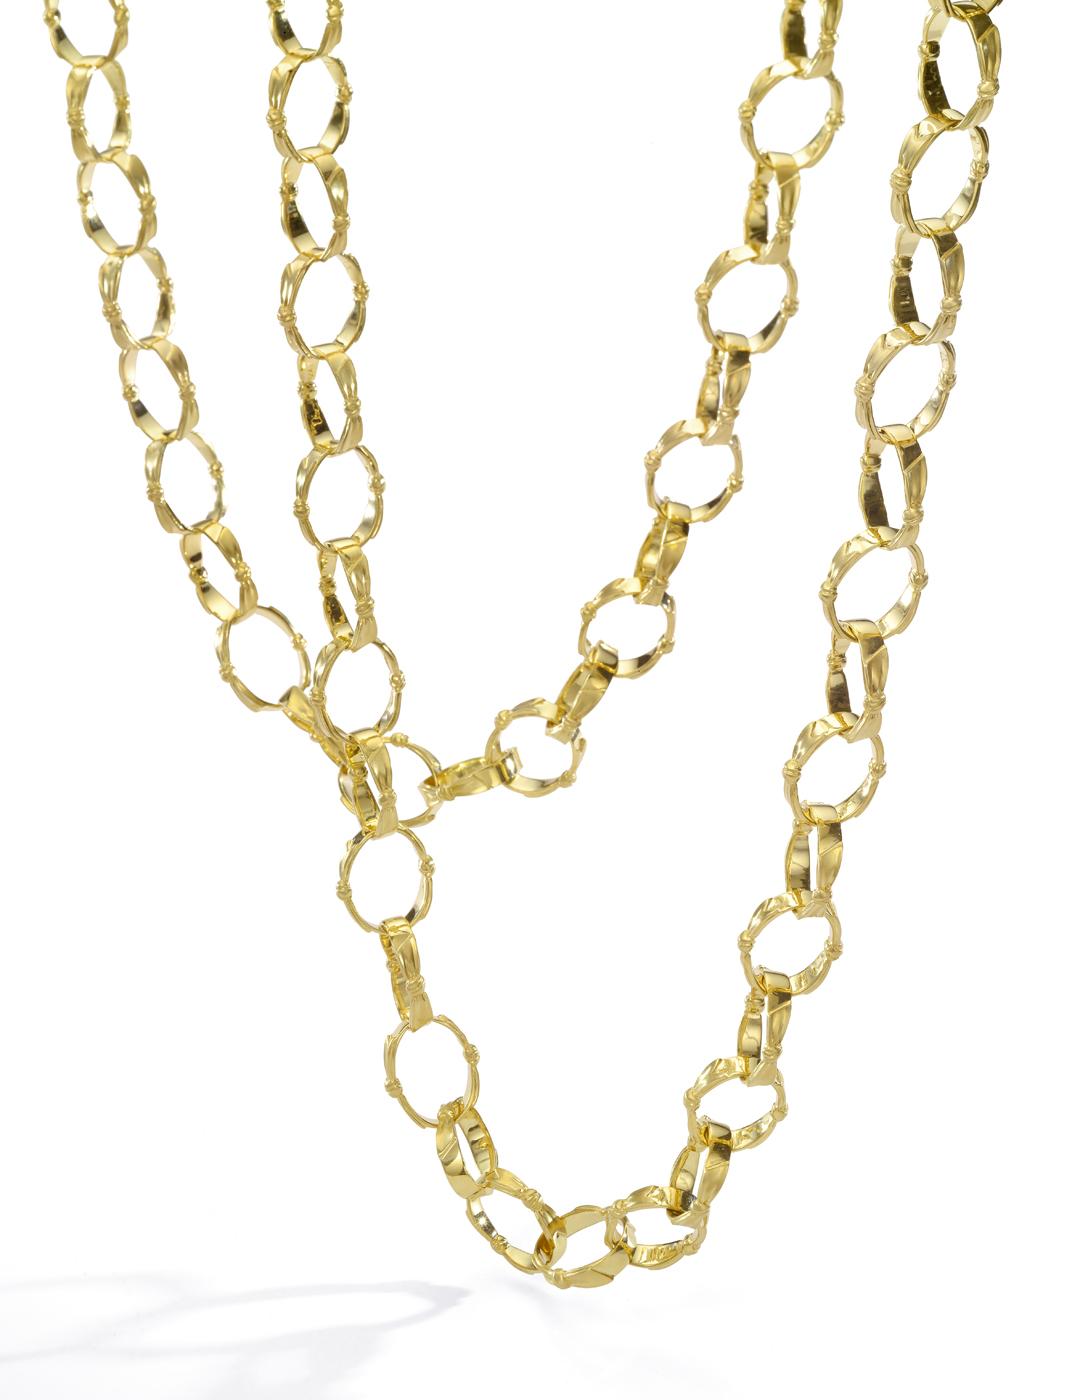 mish_necklaces_Bond Bow-chain NK-1